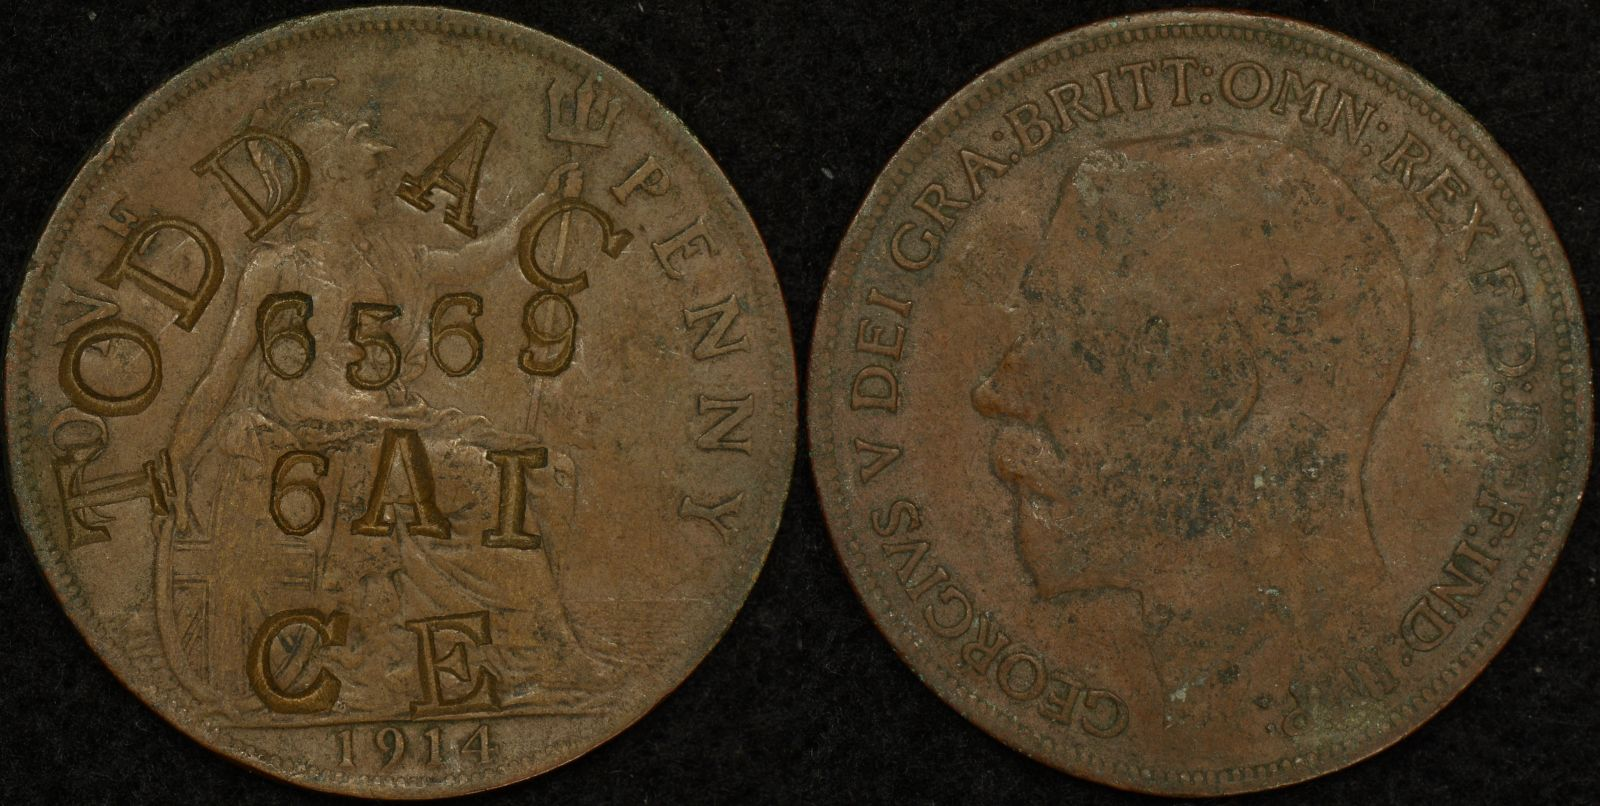 Australian World War 1 Identity Disc 6569 A.C. Todd